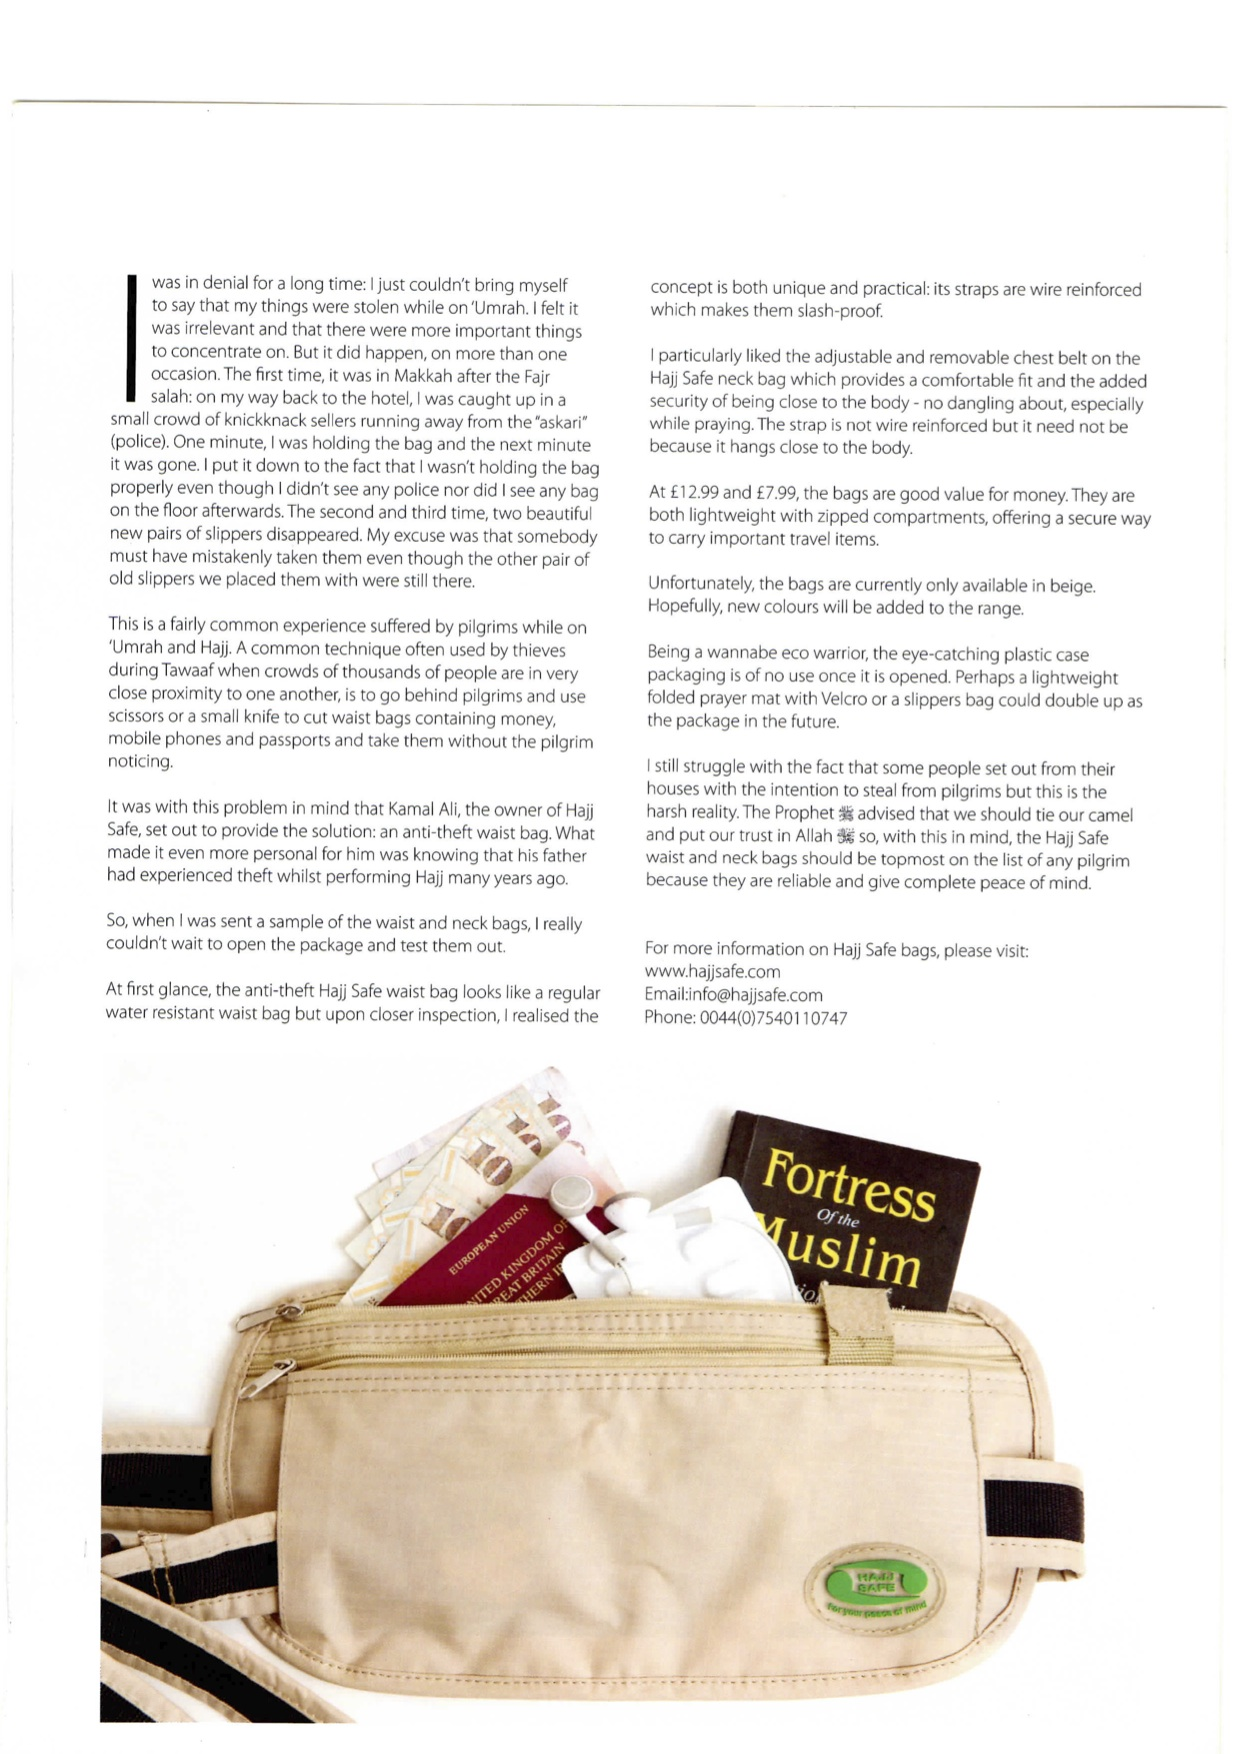 sisters-magazine-hajj-safe-2.jpg